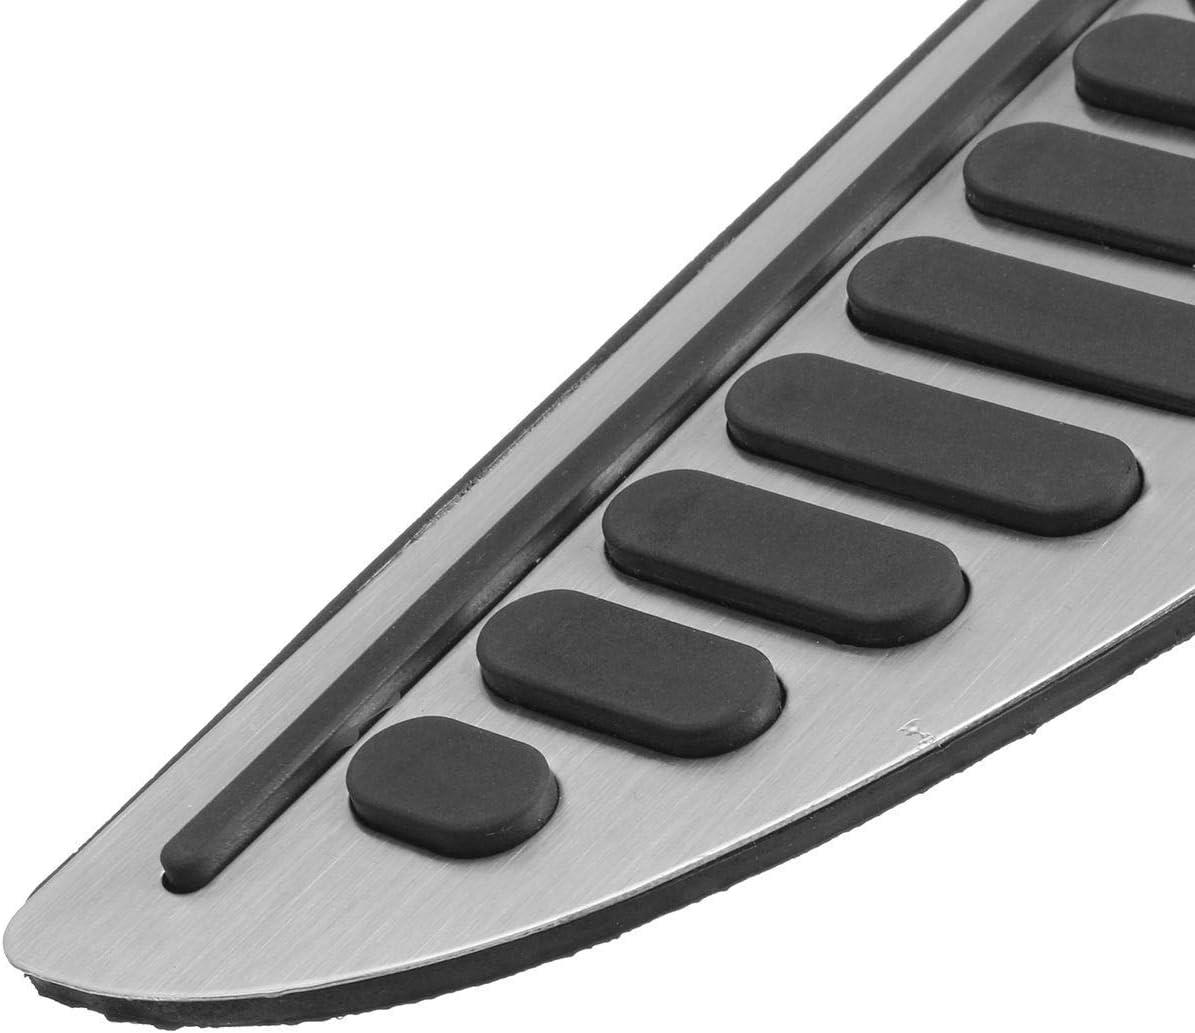 Tiamu Coche No Taladro Antideslizante Reposapi/és Reposapi/és Pedal Cubierta Adhesivo para Focus Fiesta Mondeo Accesorios de Coche